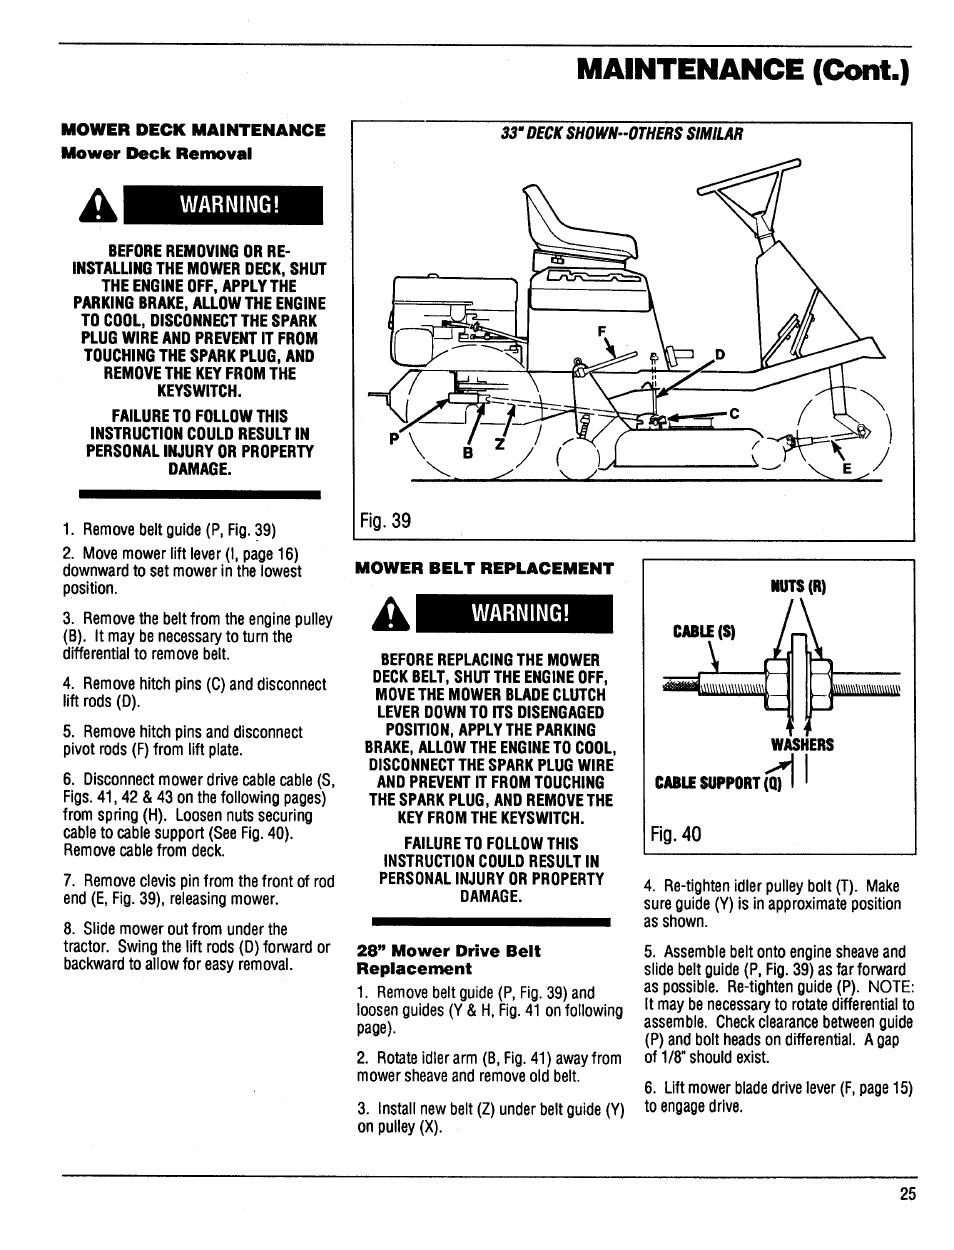 BOLENS REPAIR MANUAL - Auto Electrical Wiring Diagram on